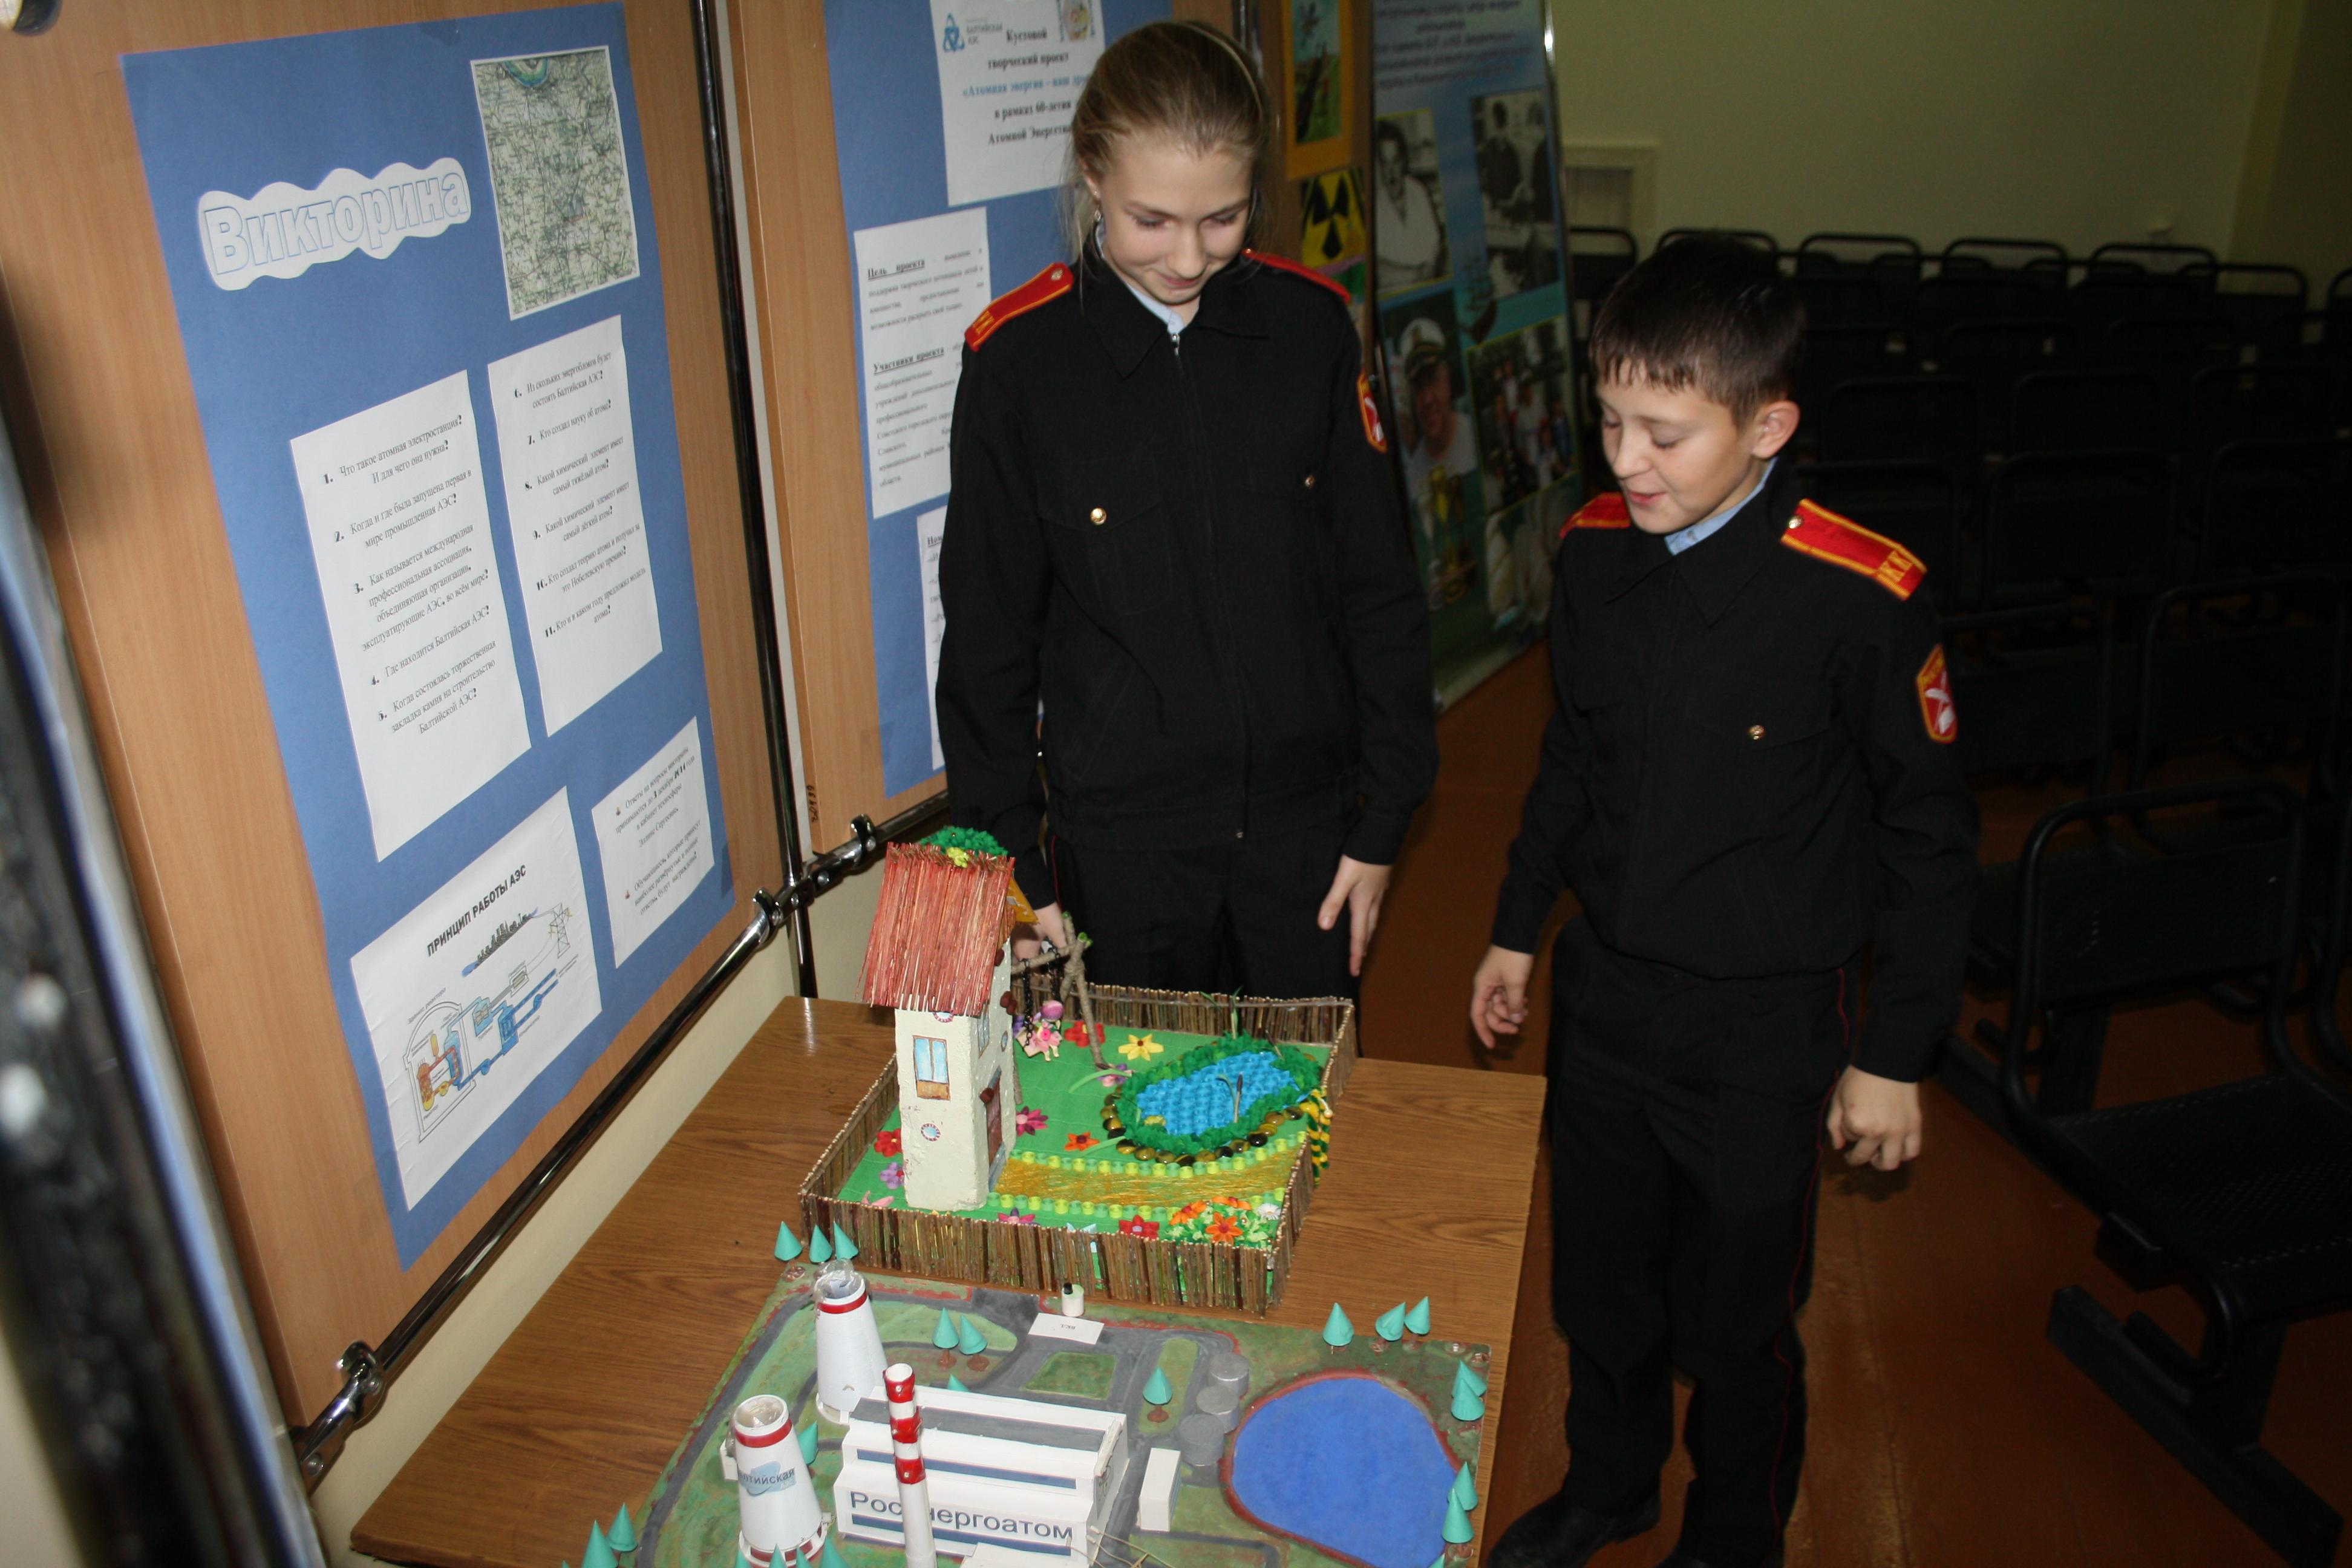 презентация на тему атомная энергия